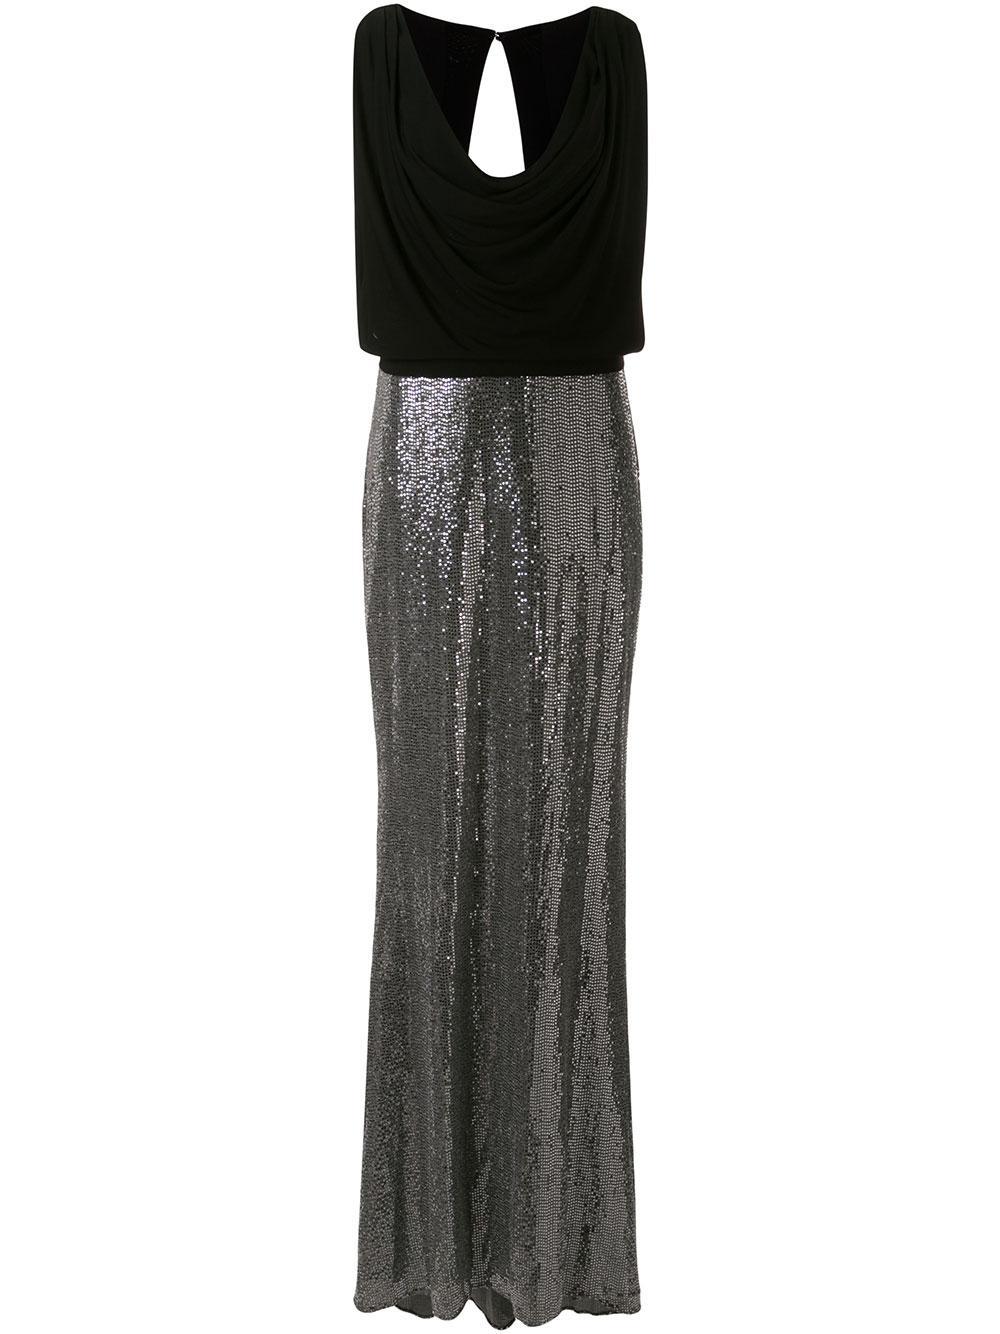 Blouson Bodice Cowl Neck Gown Item # EG2842